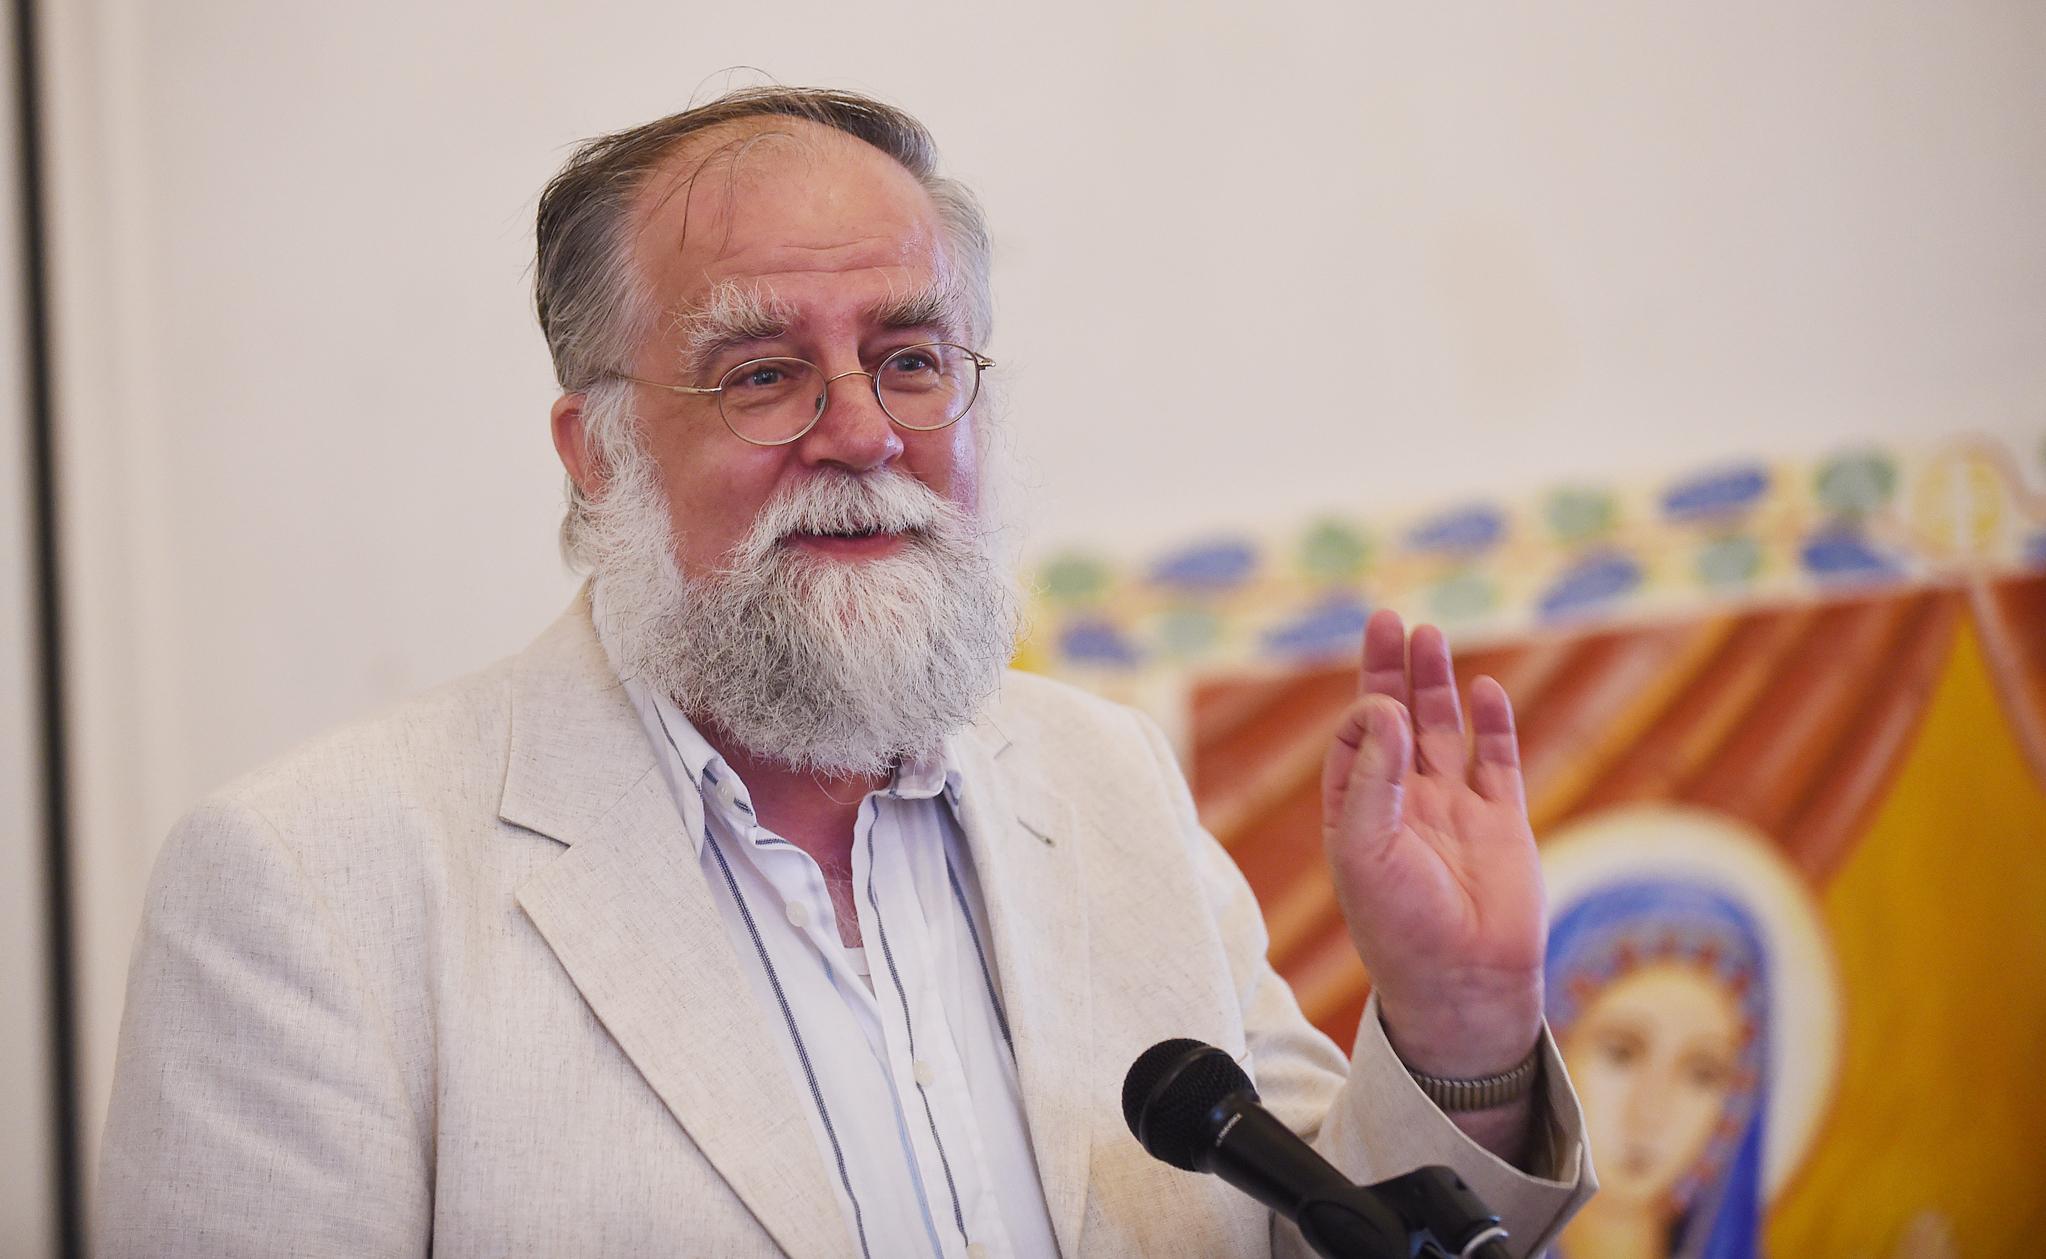 Vortrag von Prof. Dr. Dr. h.c. mult. Martin Tamcke. Foto: Maria Hopp